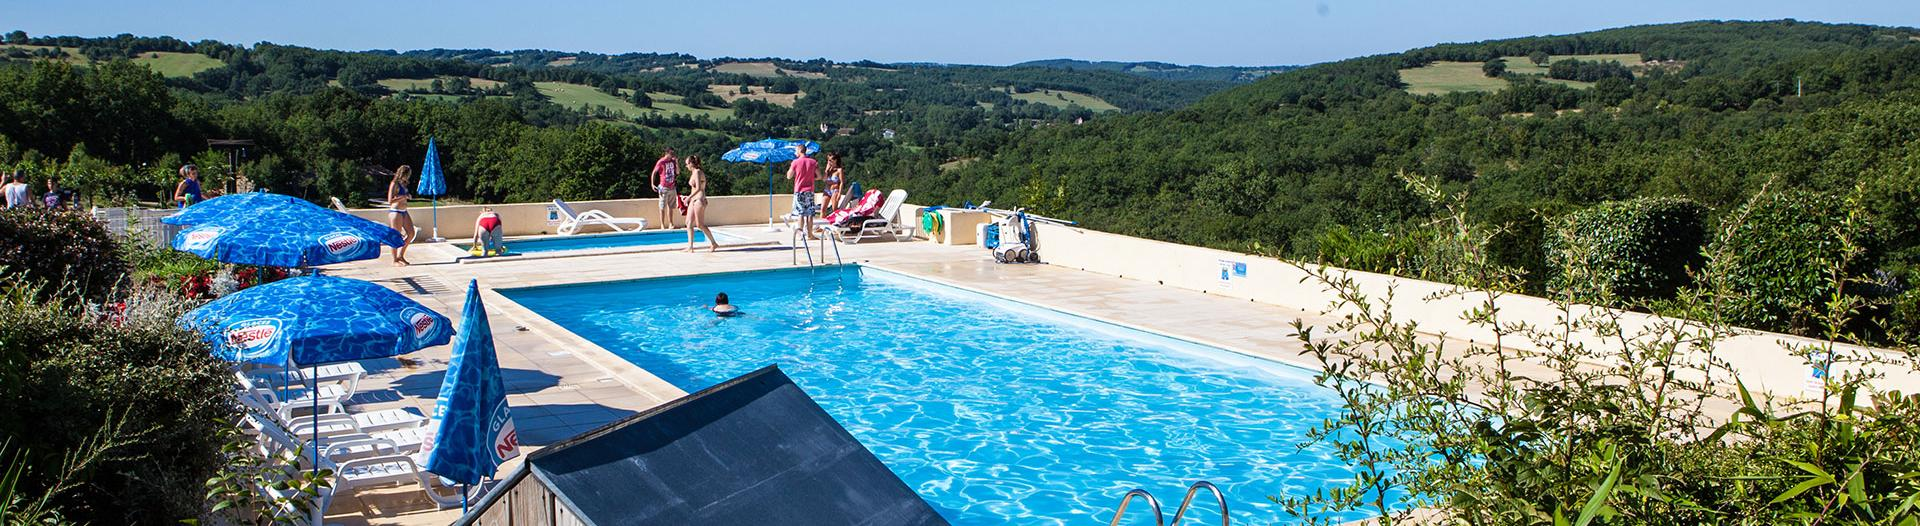 Slider-camping-domaine-la-faurie-piscine-1920x600-02